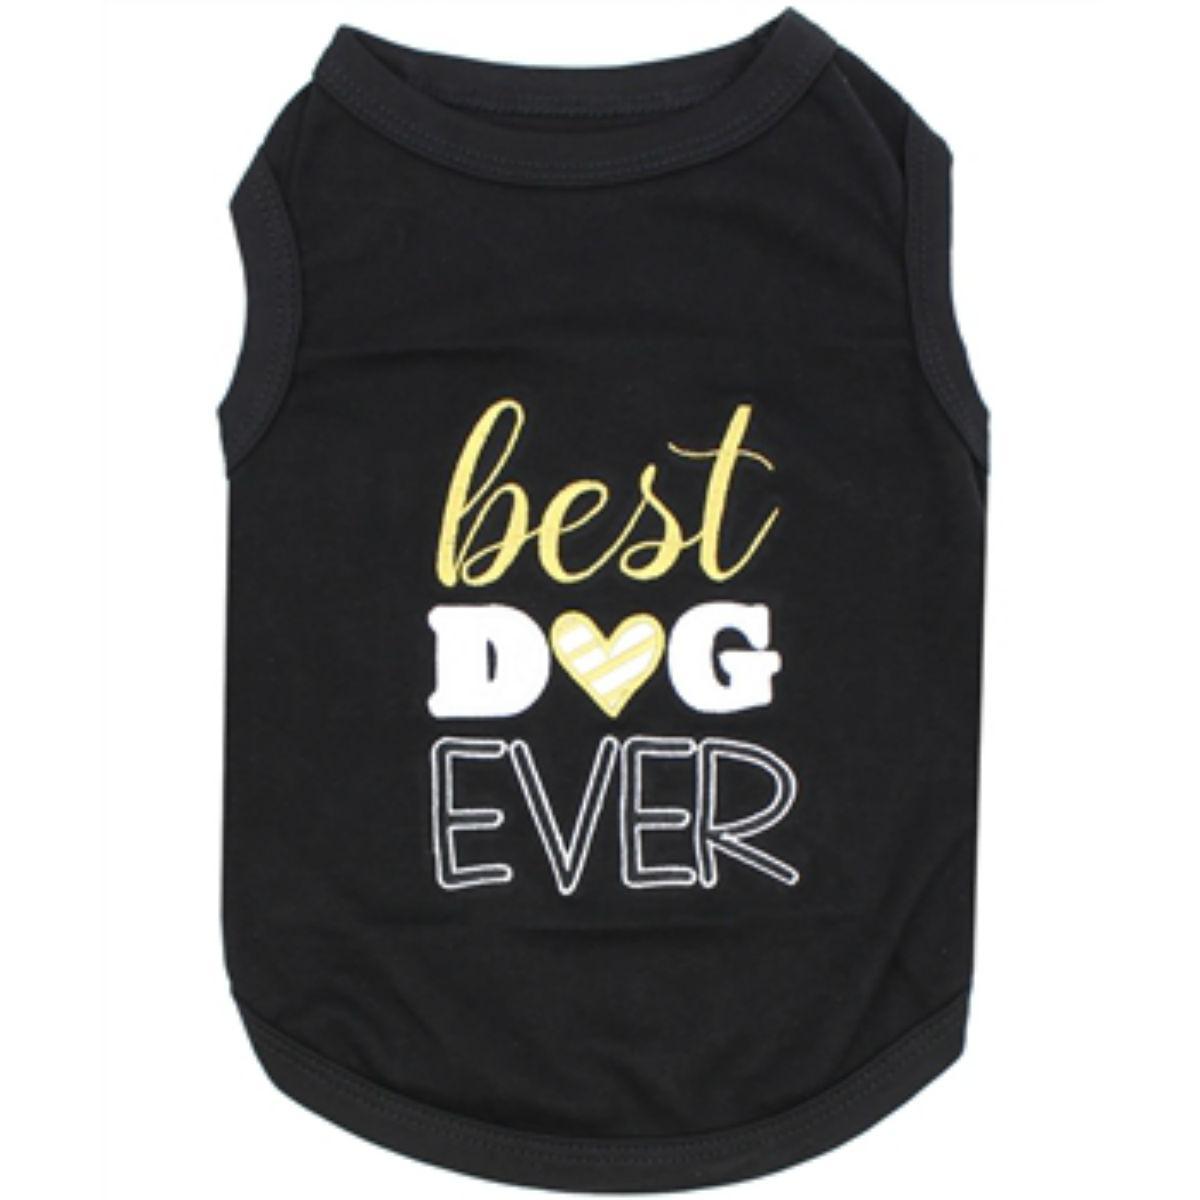 Best Dog Ever Dog Tank by Parisian Pet - Black